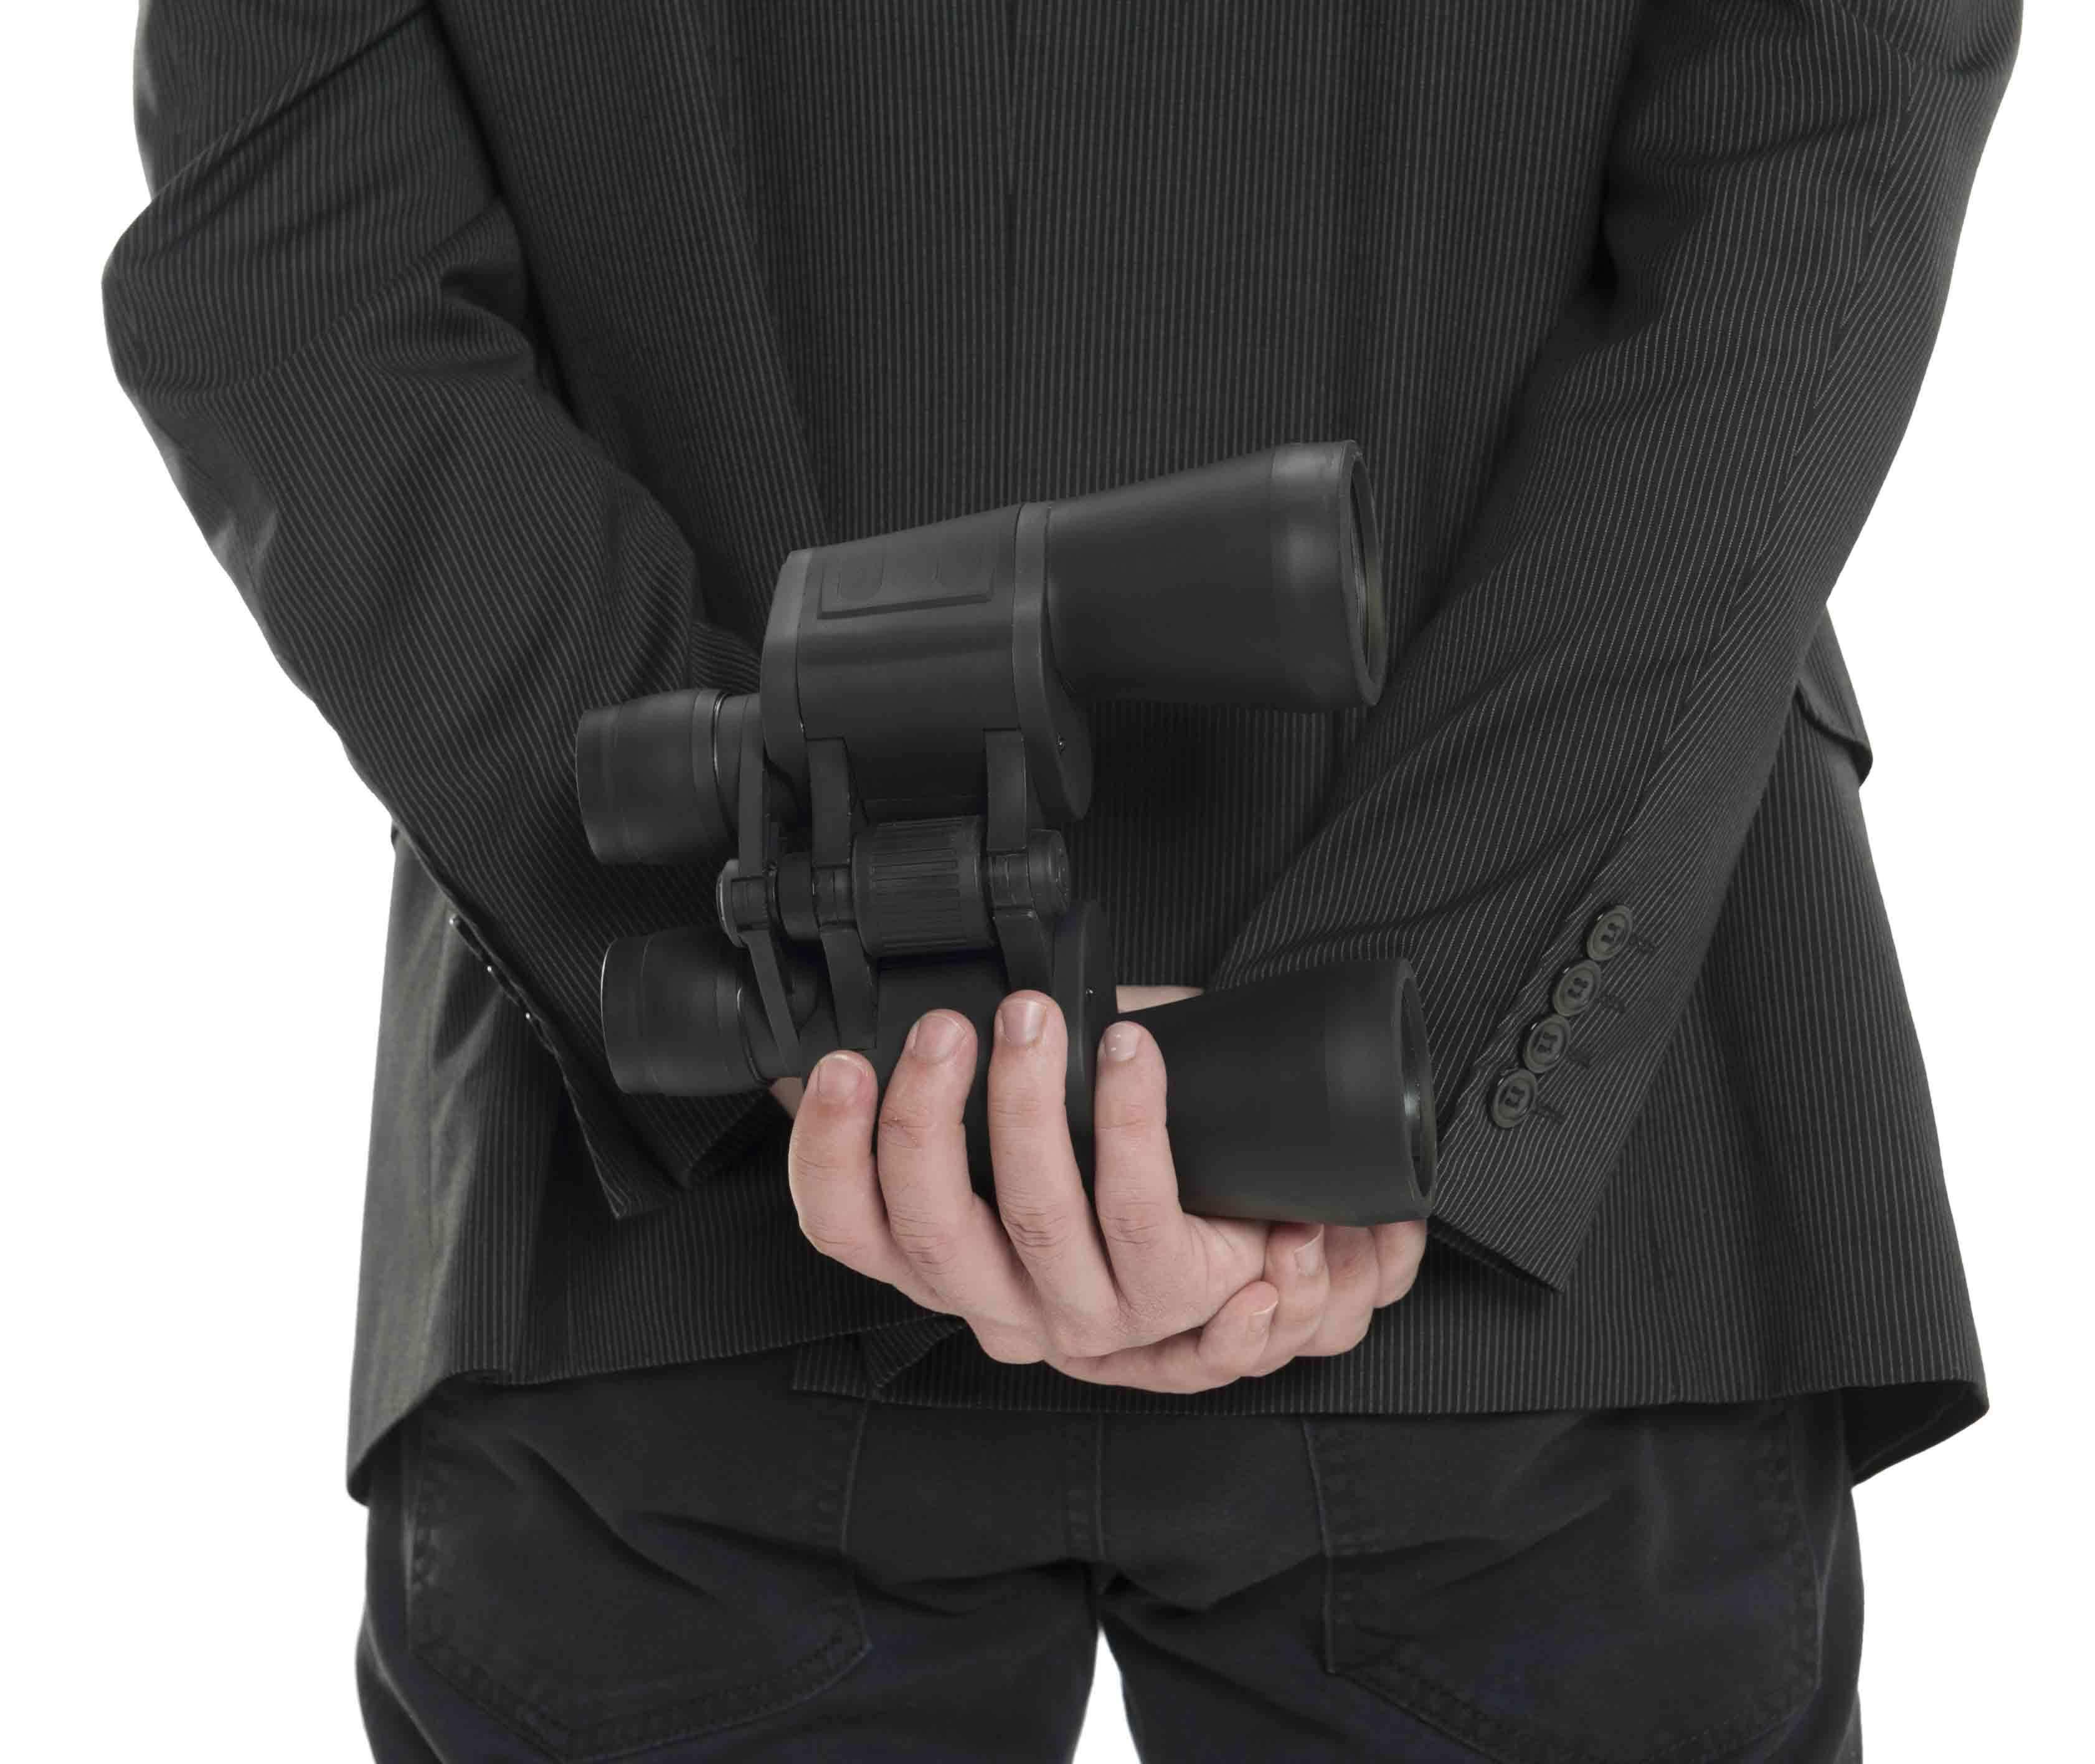 Executive Protection Security Services Chicago